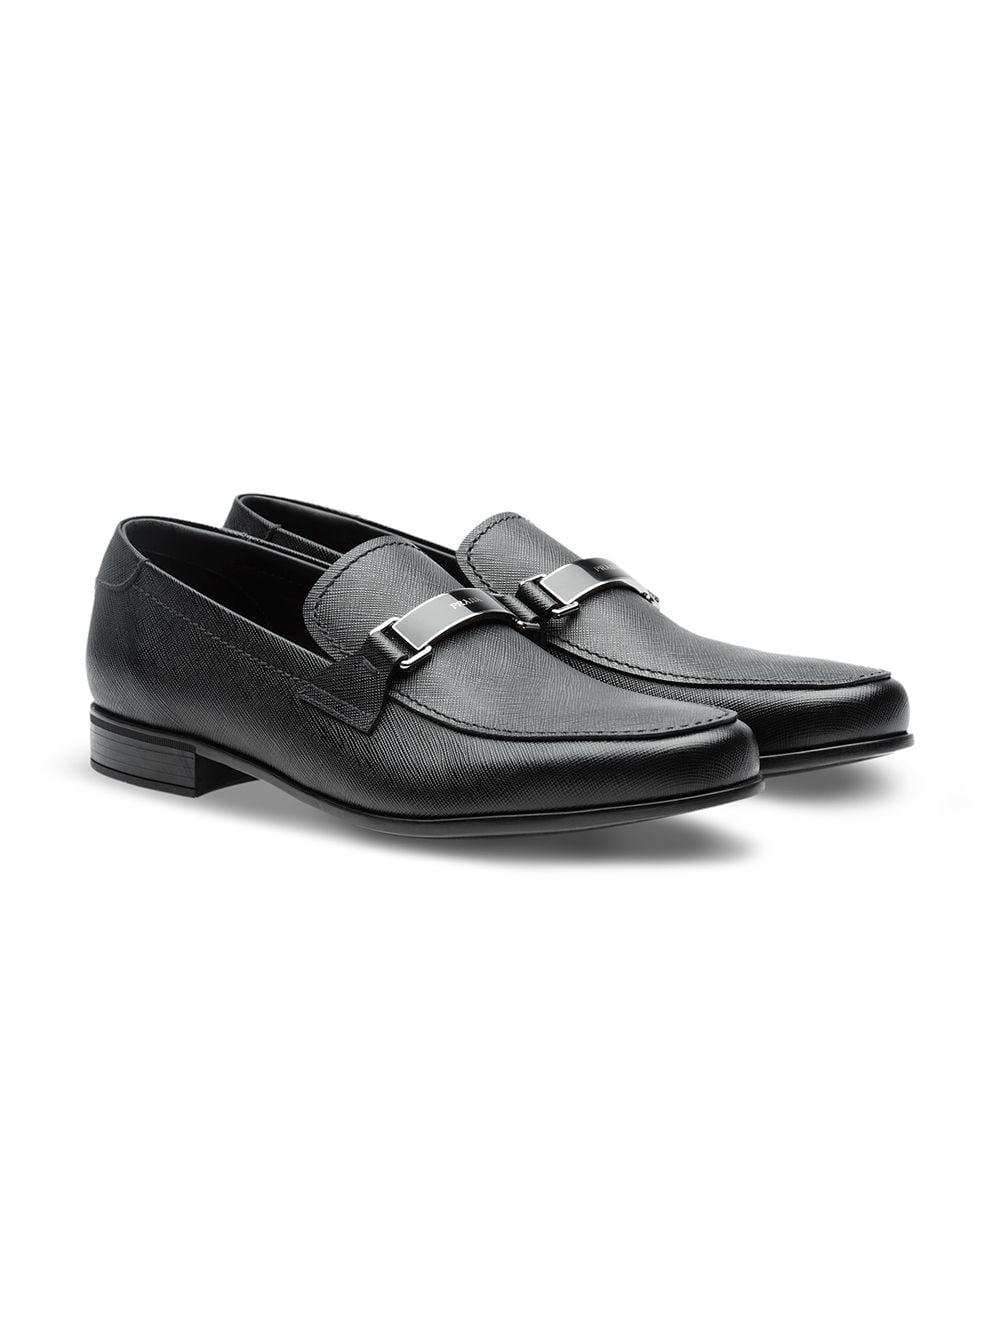 54ff5a0fcca Lyst - Prada Saffiano Leather Loafers in Black for Men